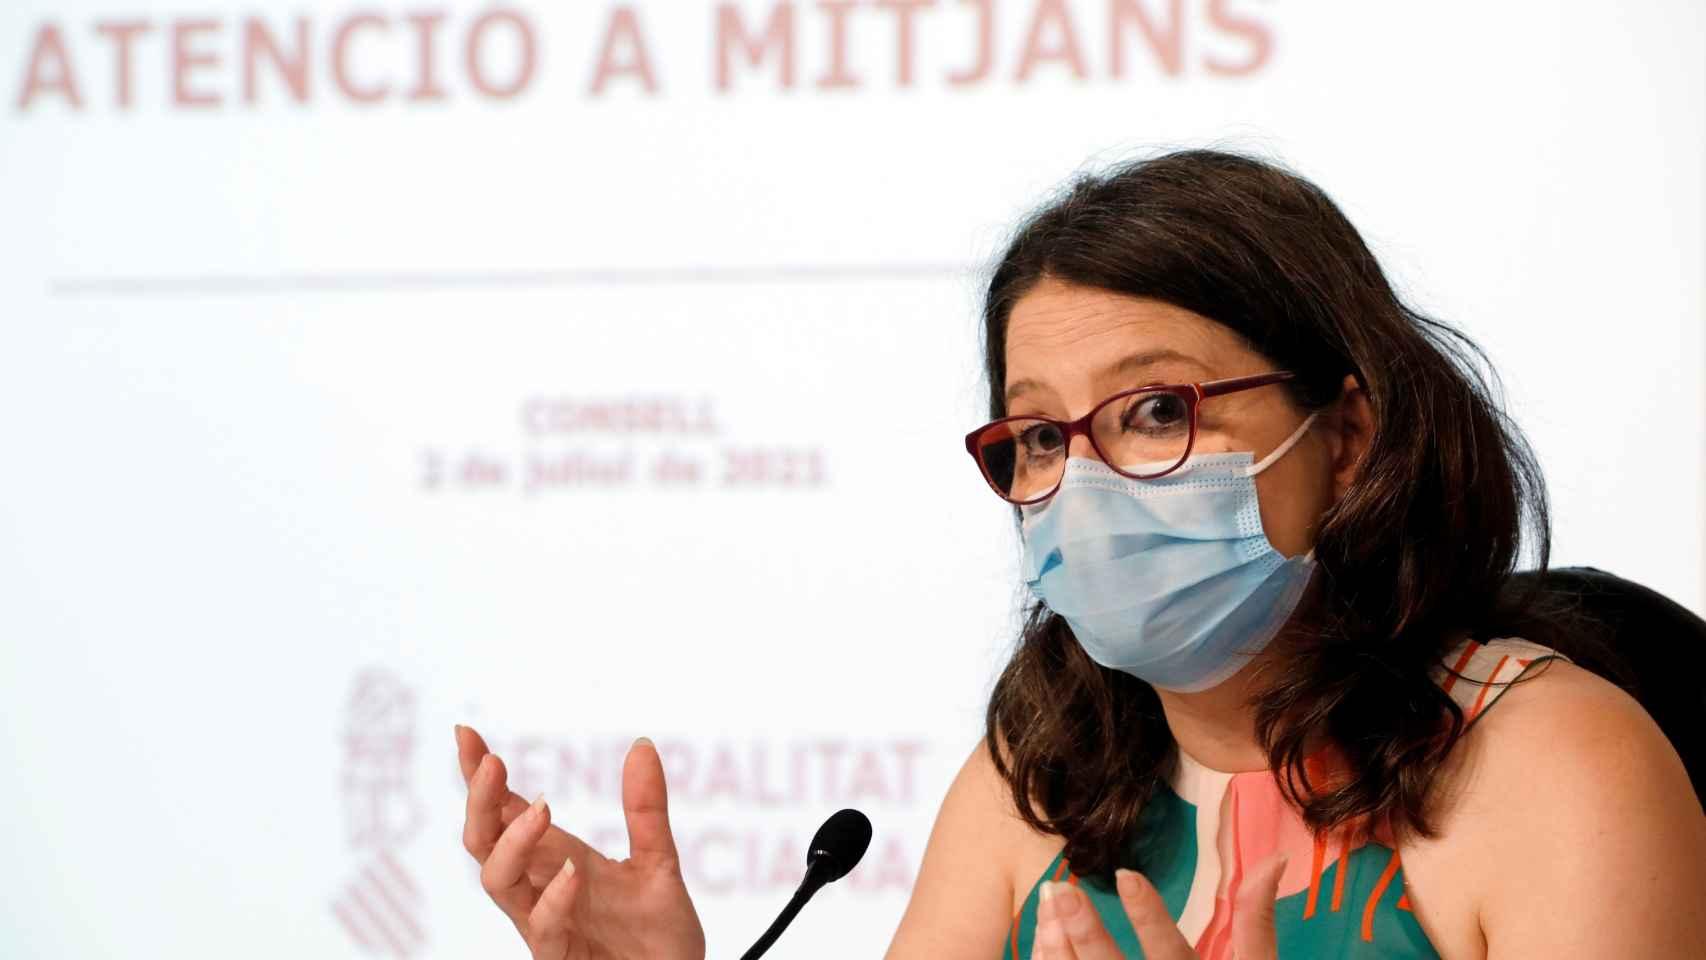 La vicepresidenta del Consell, Mónica Oltra (Compromís).